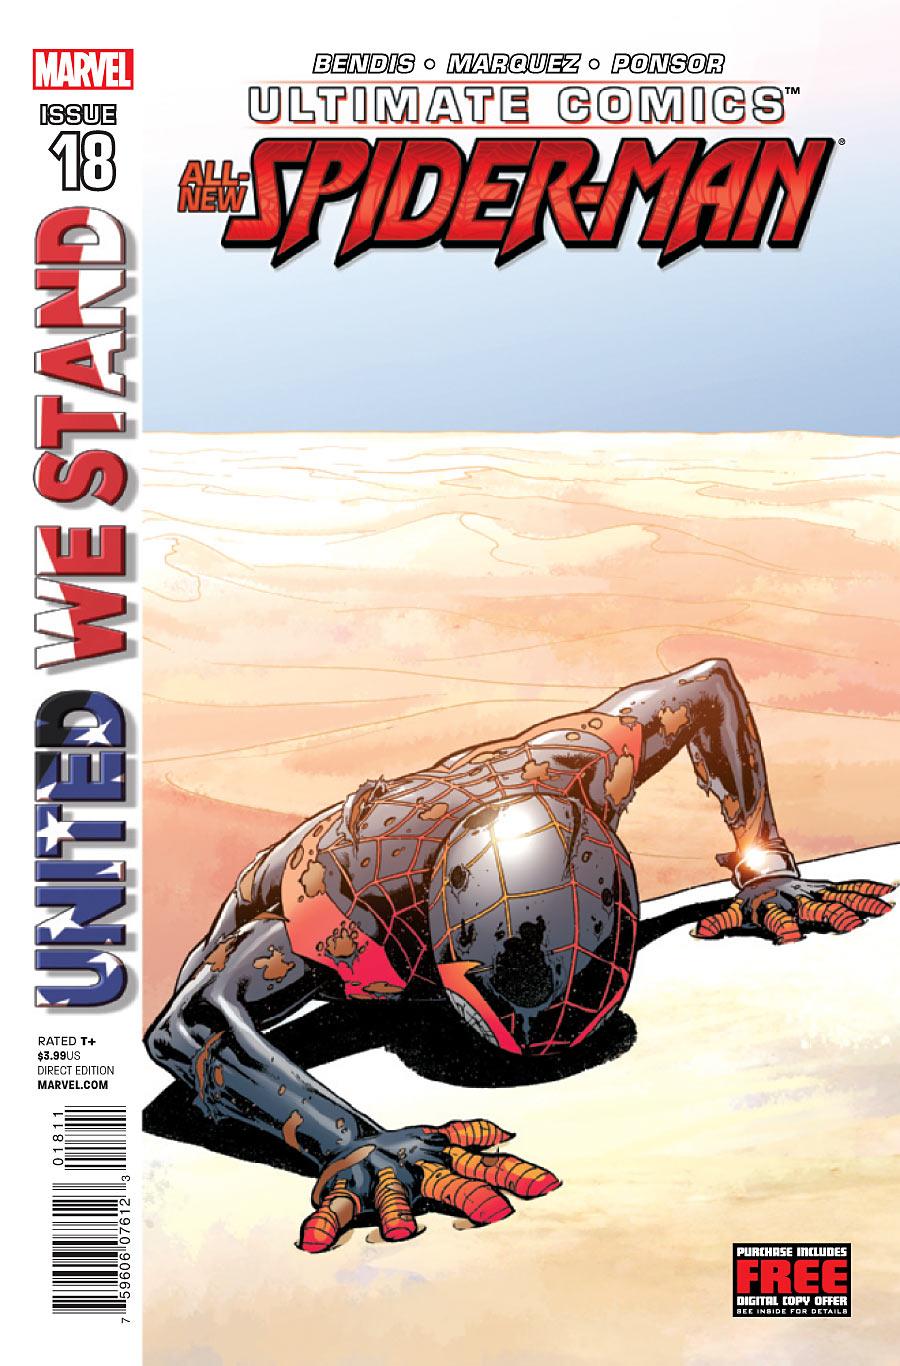 Ultimate Comics Spider-Man #18